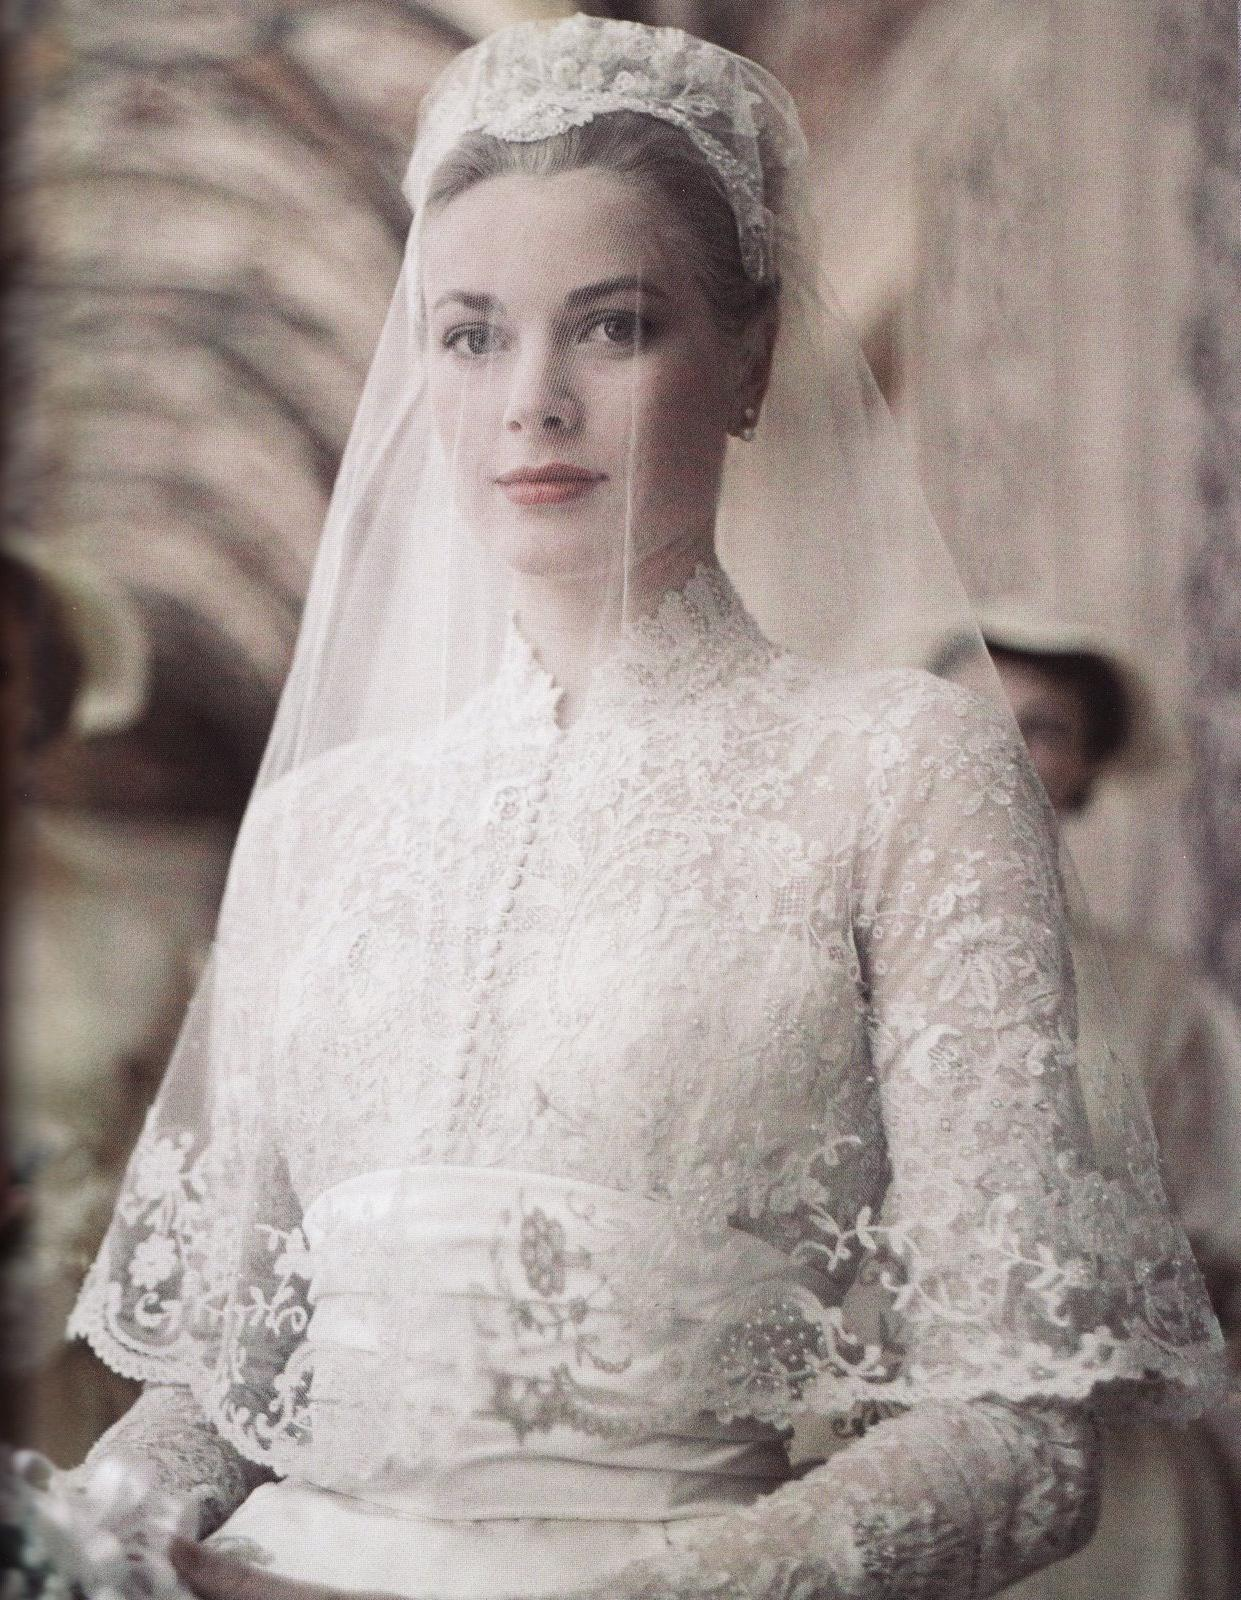 in her Oscar dress are lovely.